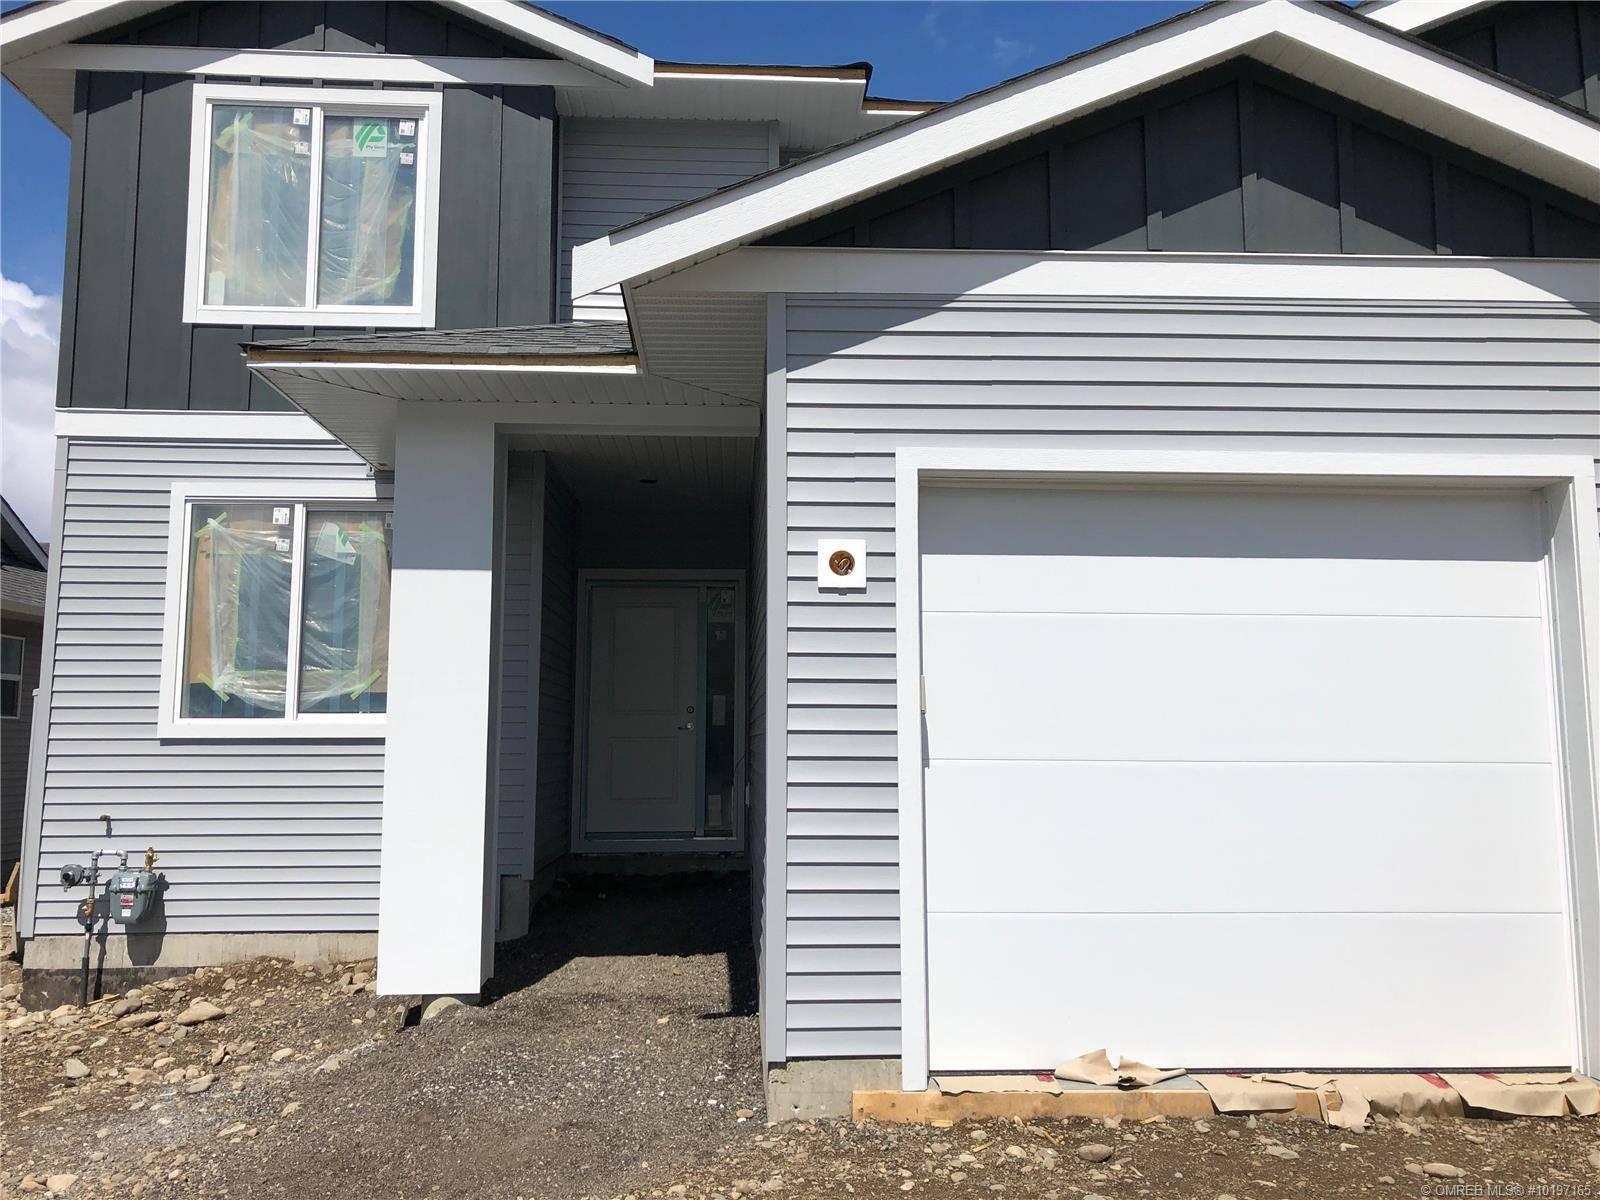 House for sale at 492 Sugars Ave Kelowna British Columbia - MLS: 10197165